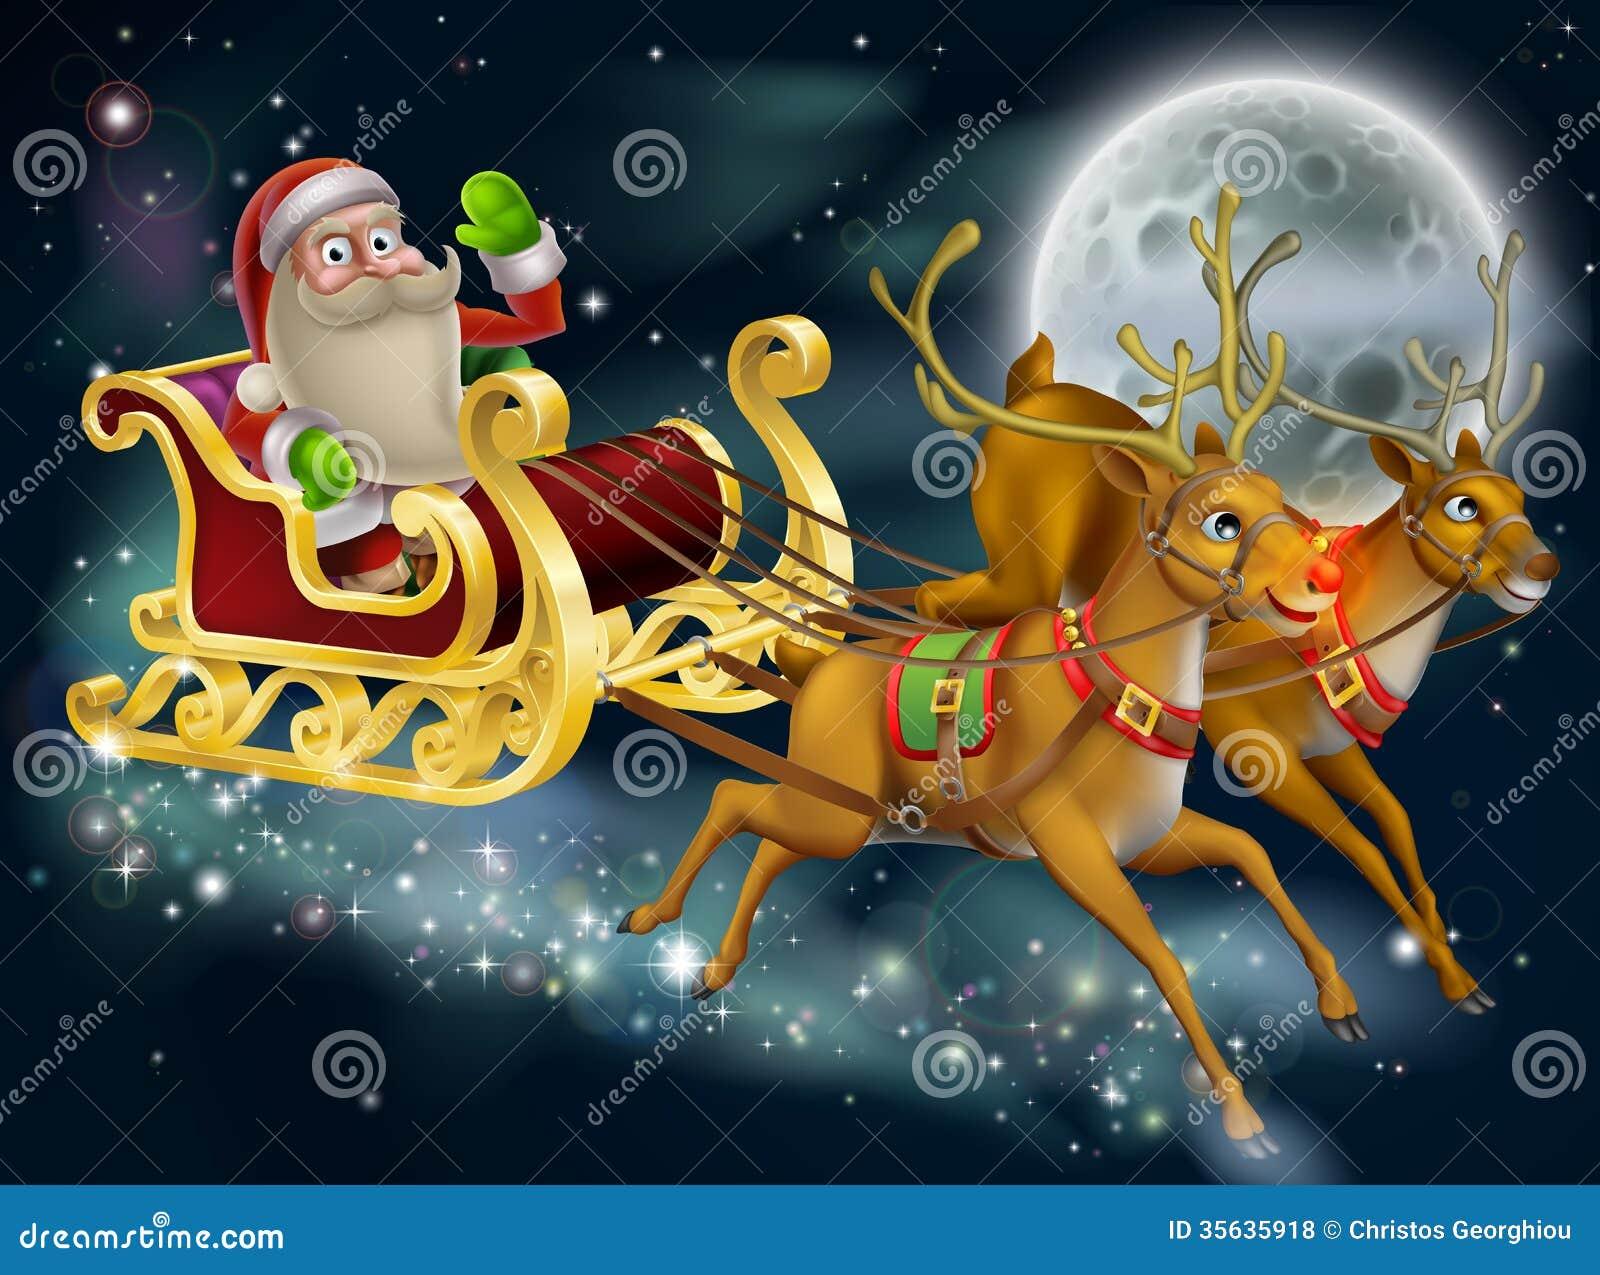 Santa Claus Sleigh Scene Stock Vector Illustration Of